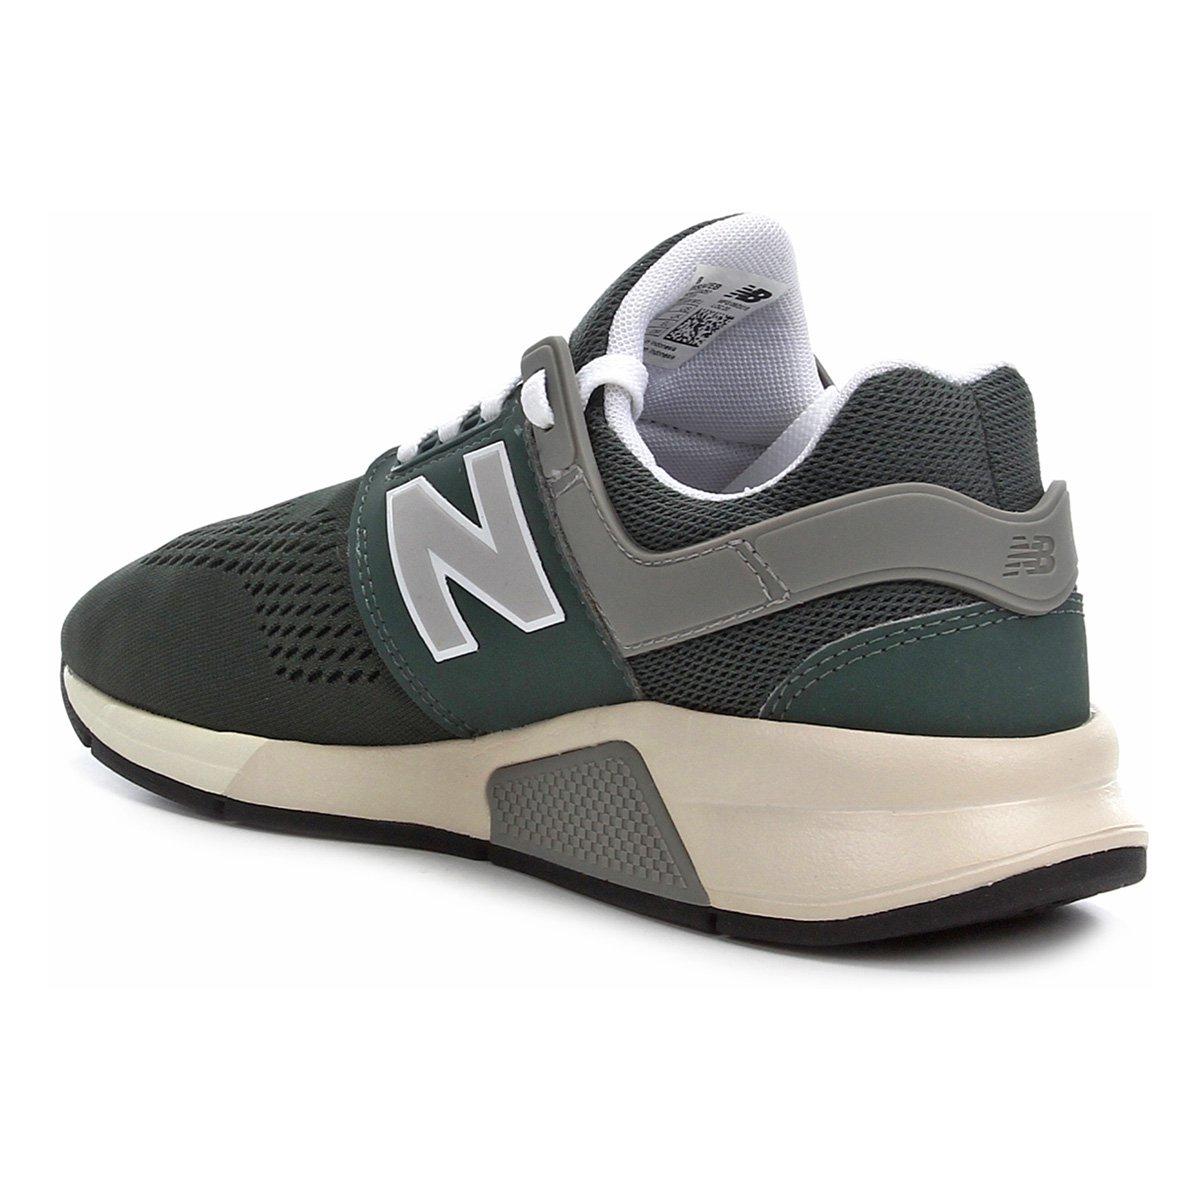 Tênis New Balance WS247 I Feminino - Verde escuro Cinza | Netshoes